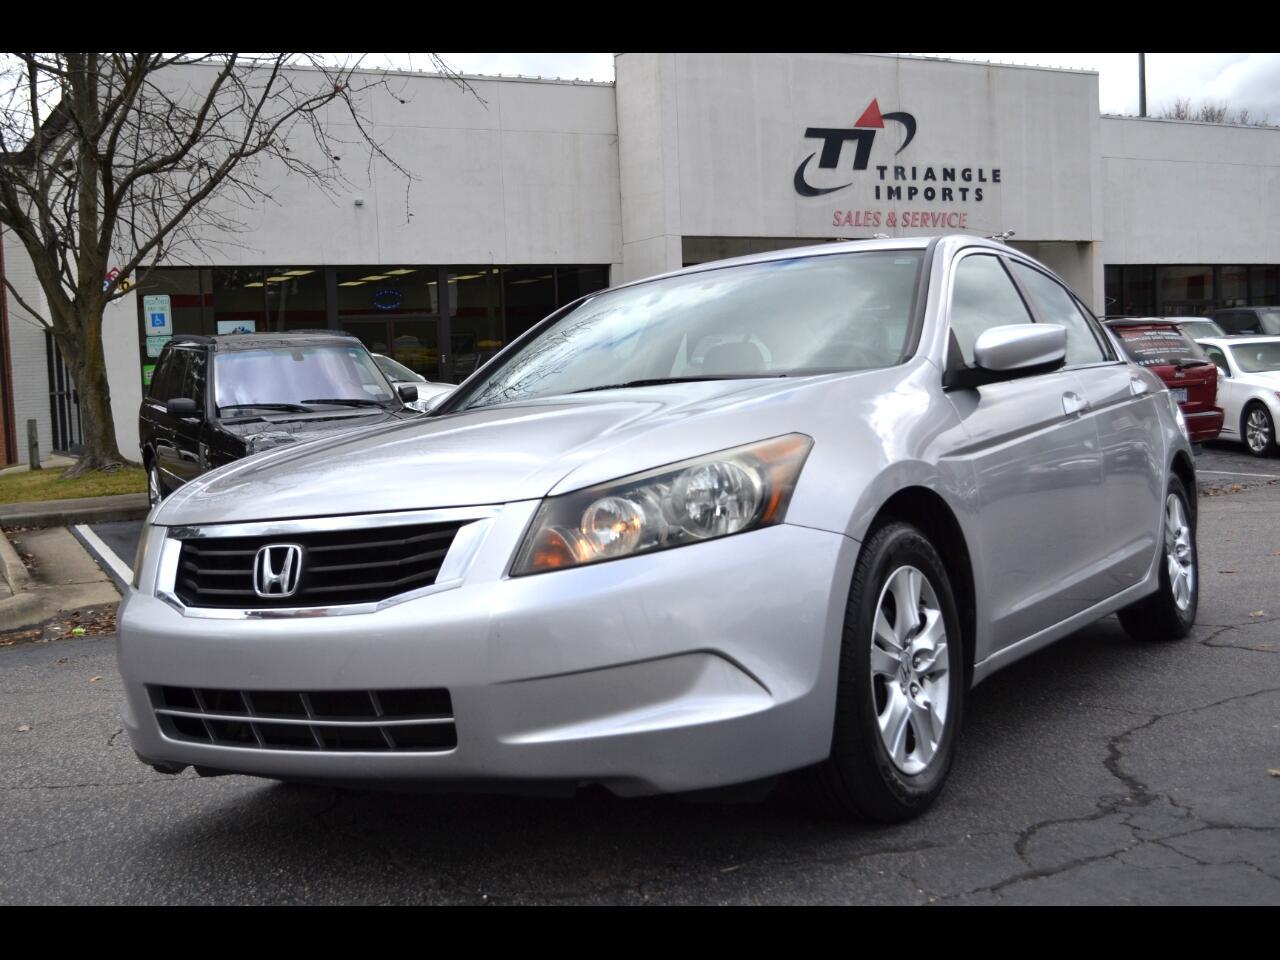 2010 Honda Accord 4dr Sedan LX Auto